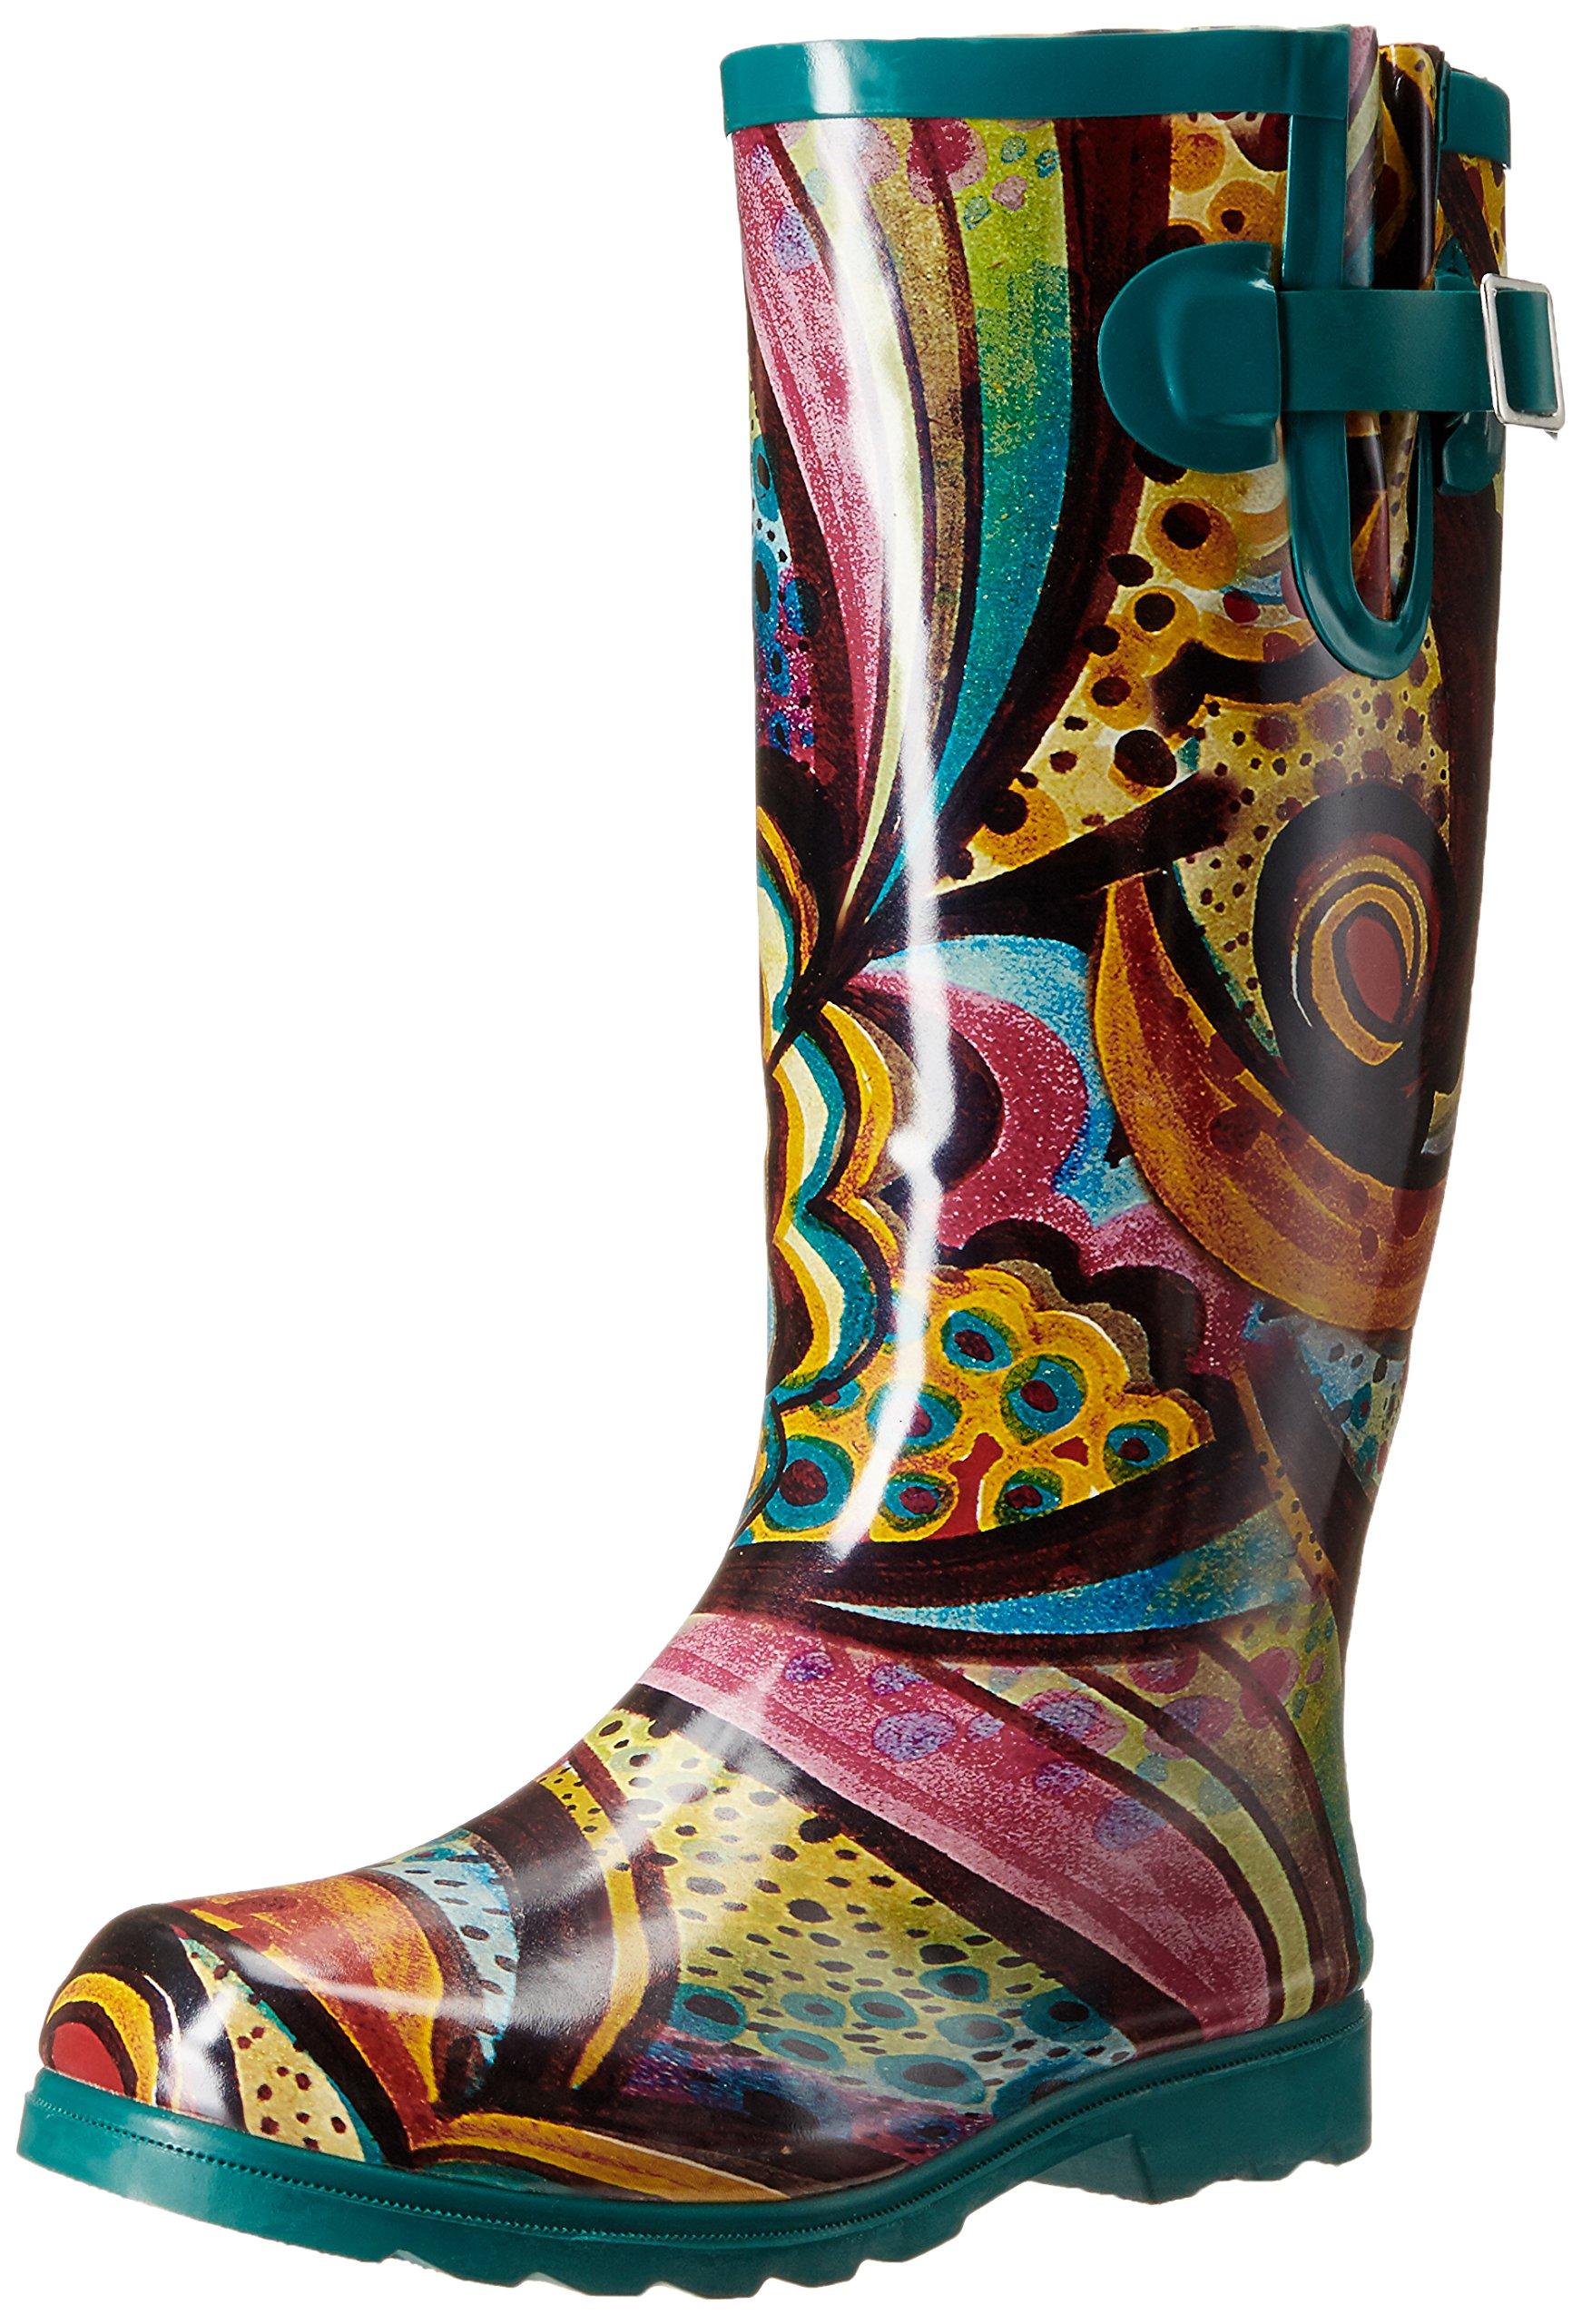 Nomad Women's Puddles Rain Boot, Turquoise Monet, 9 M US